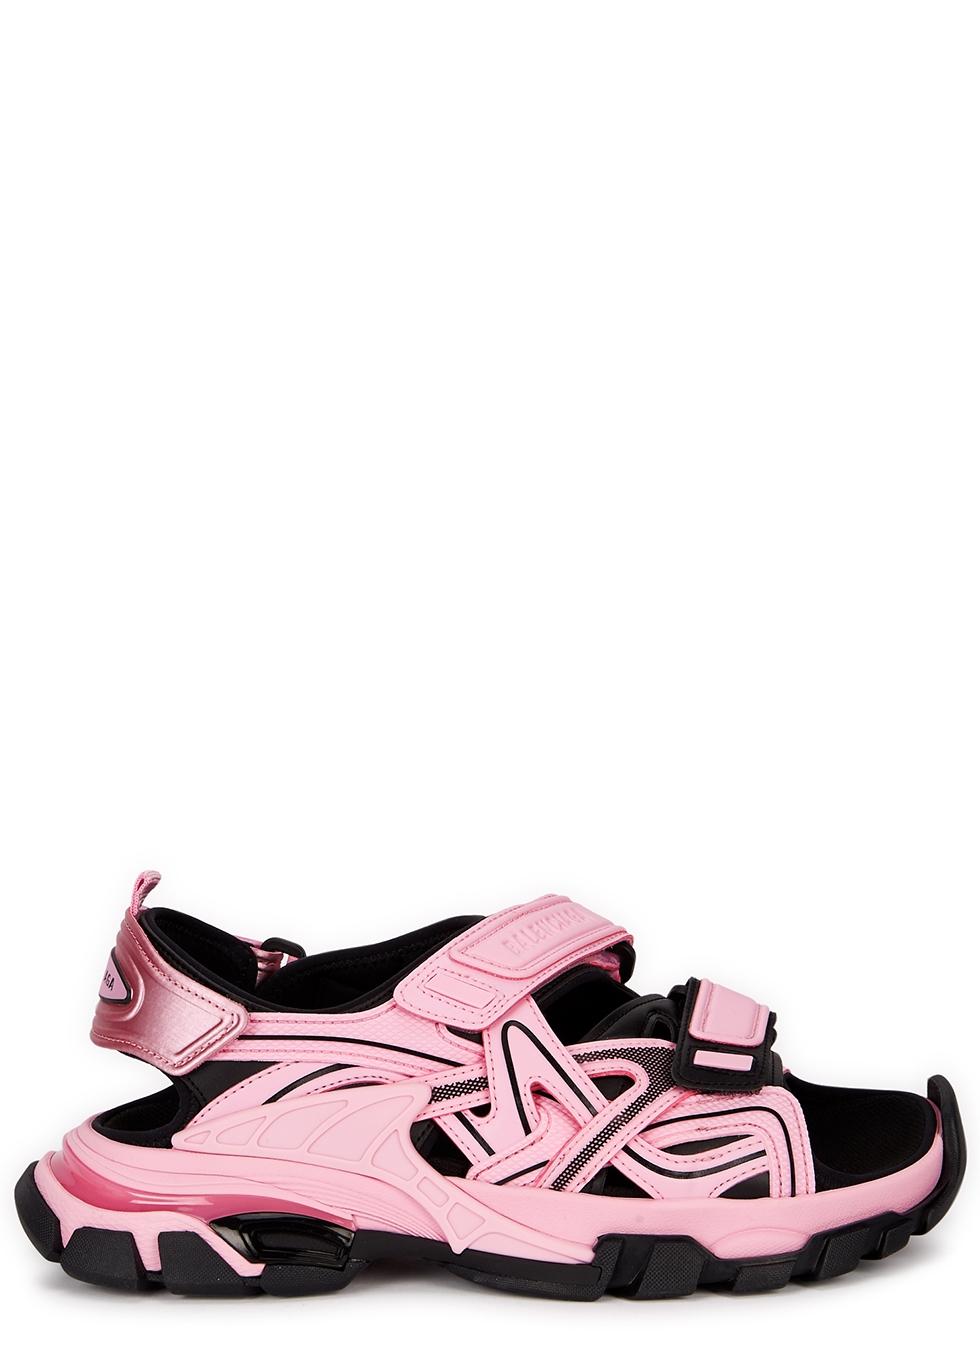 Balenciaga Track pink panelled neoprene